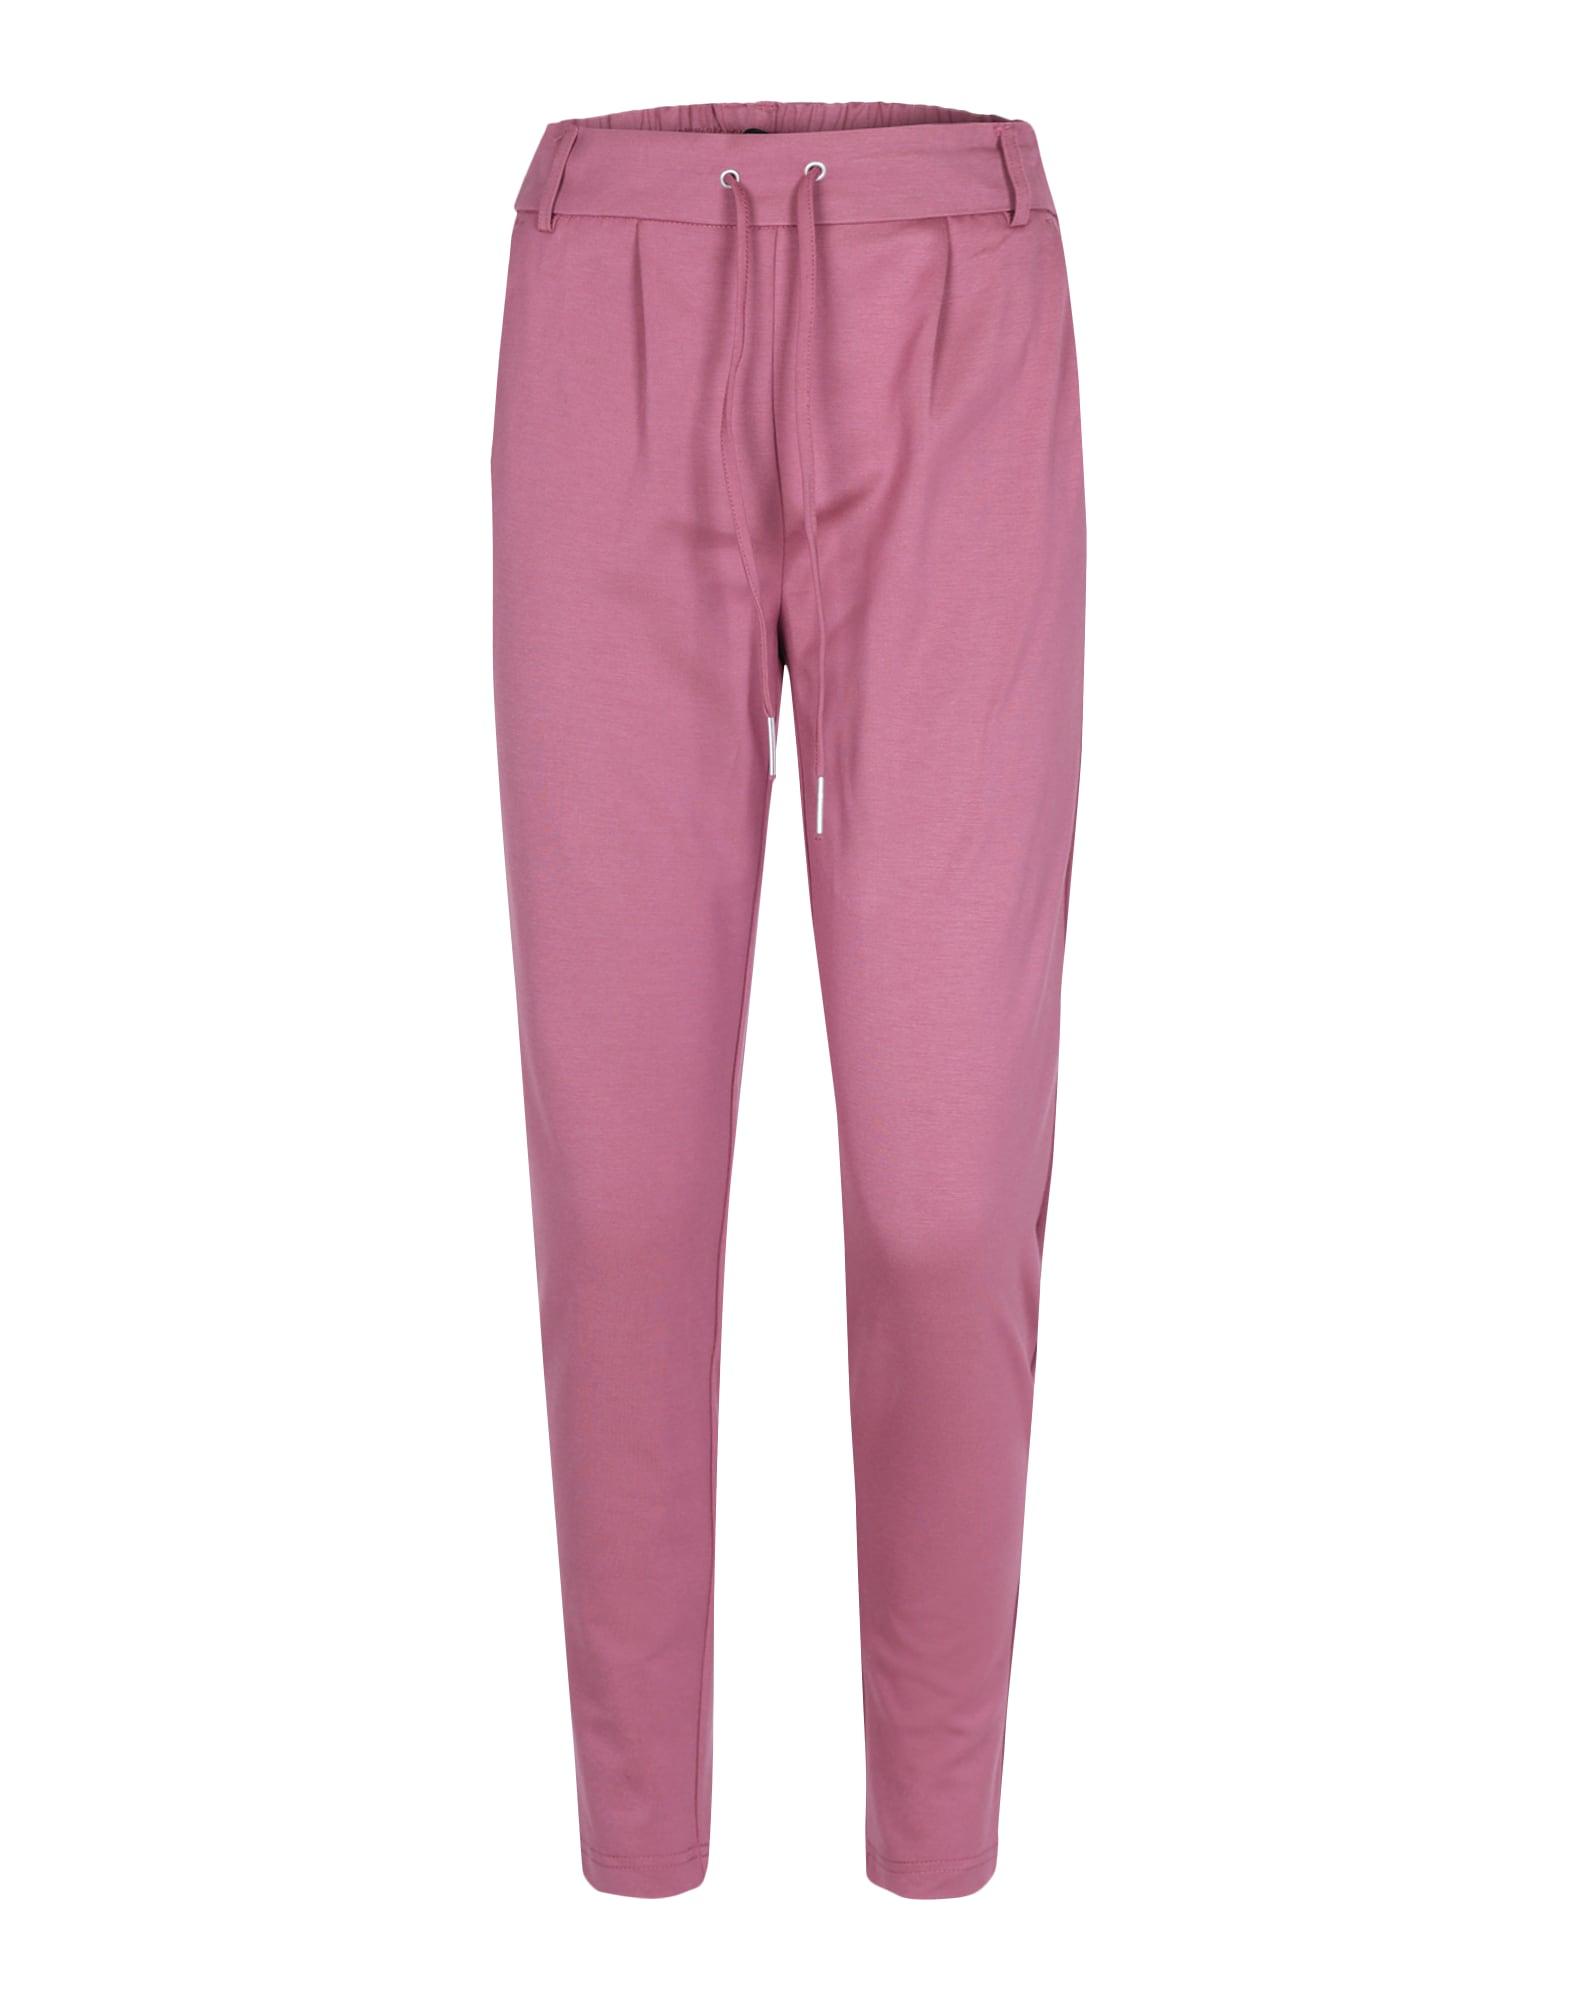 Kalhoty se sklady v pase ONLPoptrash pitaya ONLY